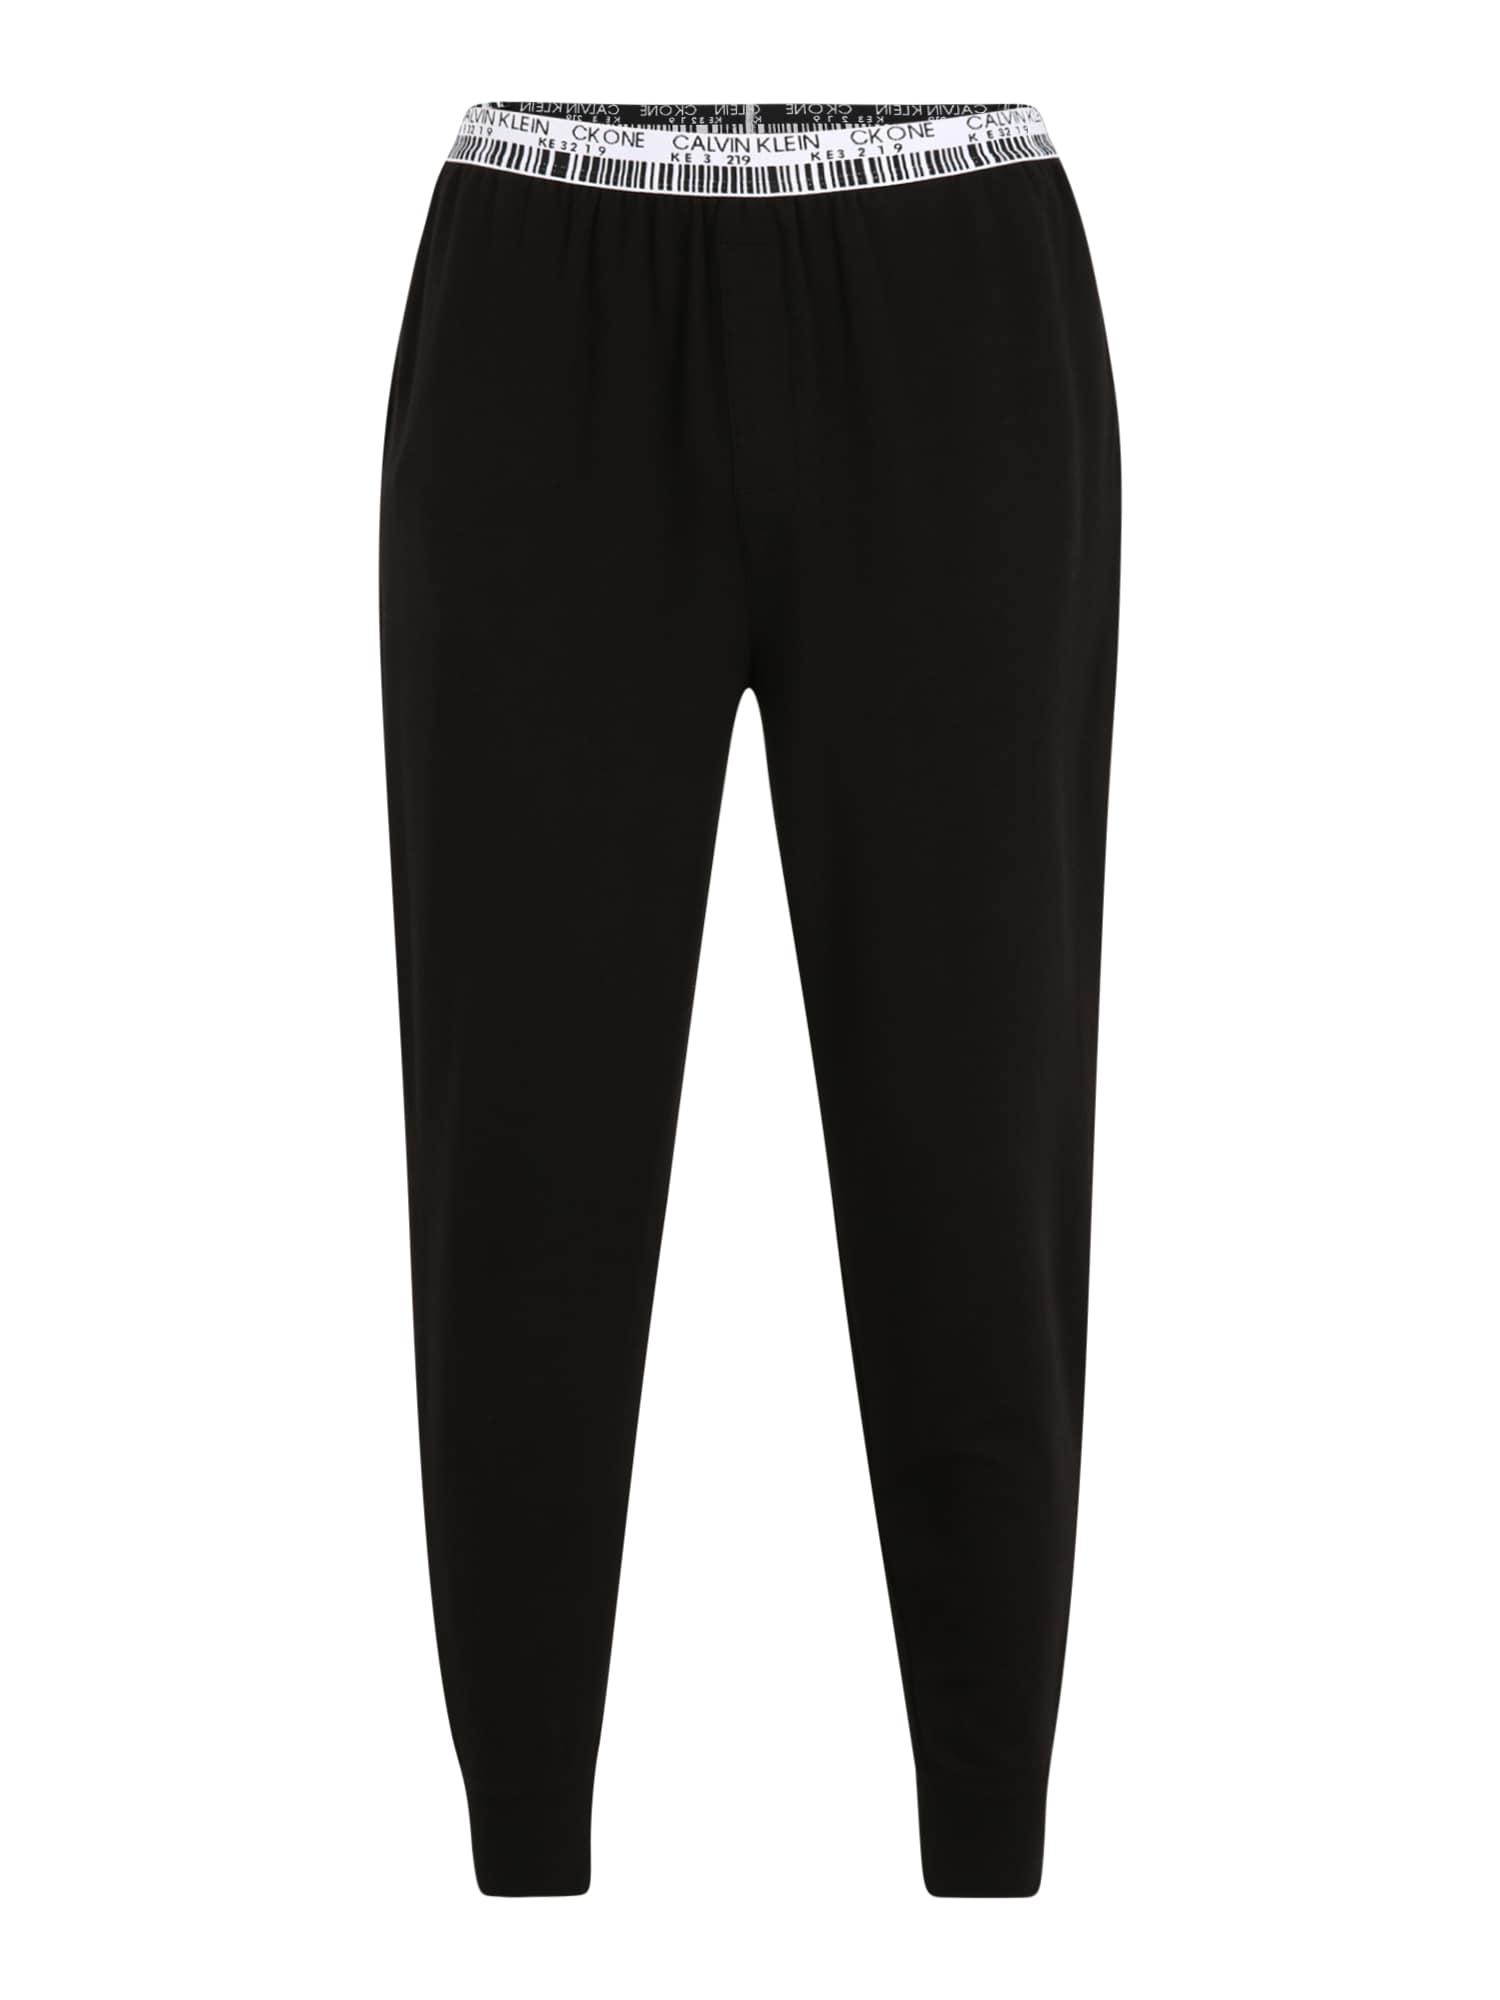 Calvin Klein Underwear Ilgos apatinės kelnaitės juoda / balta